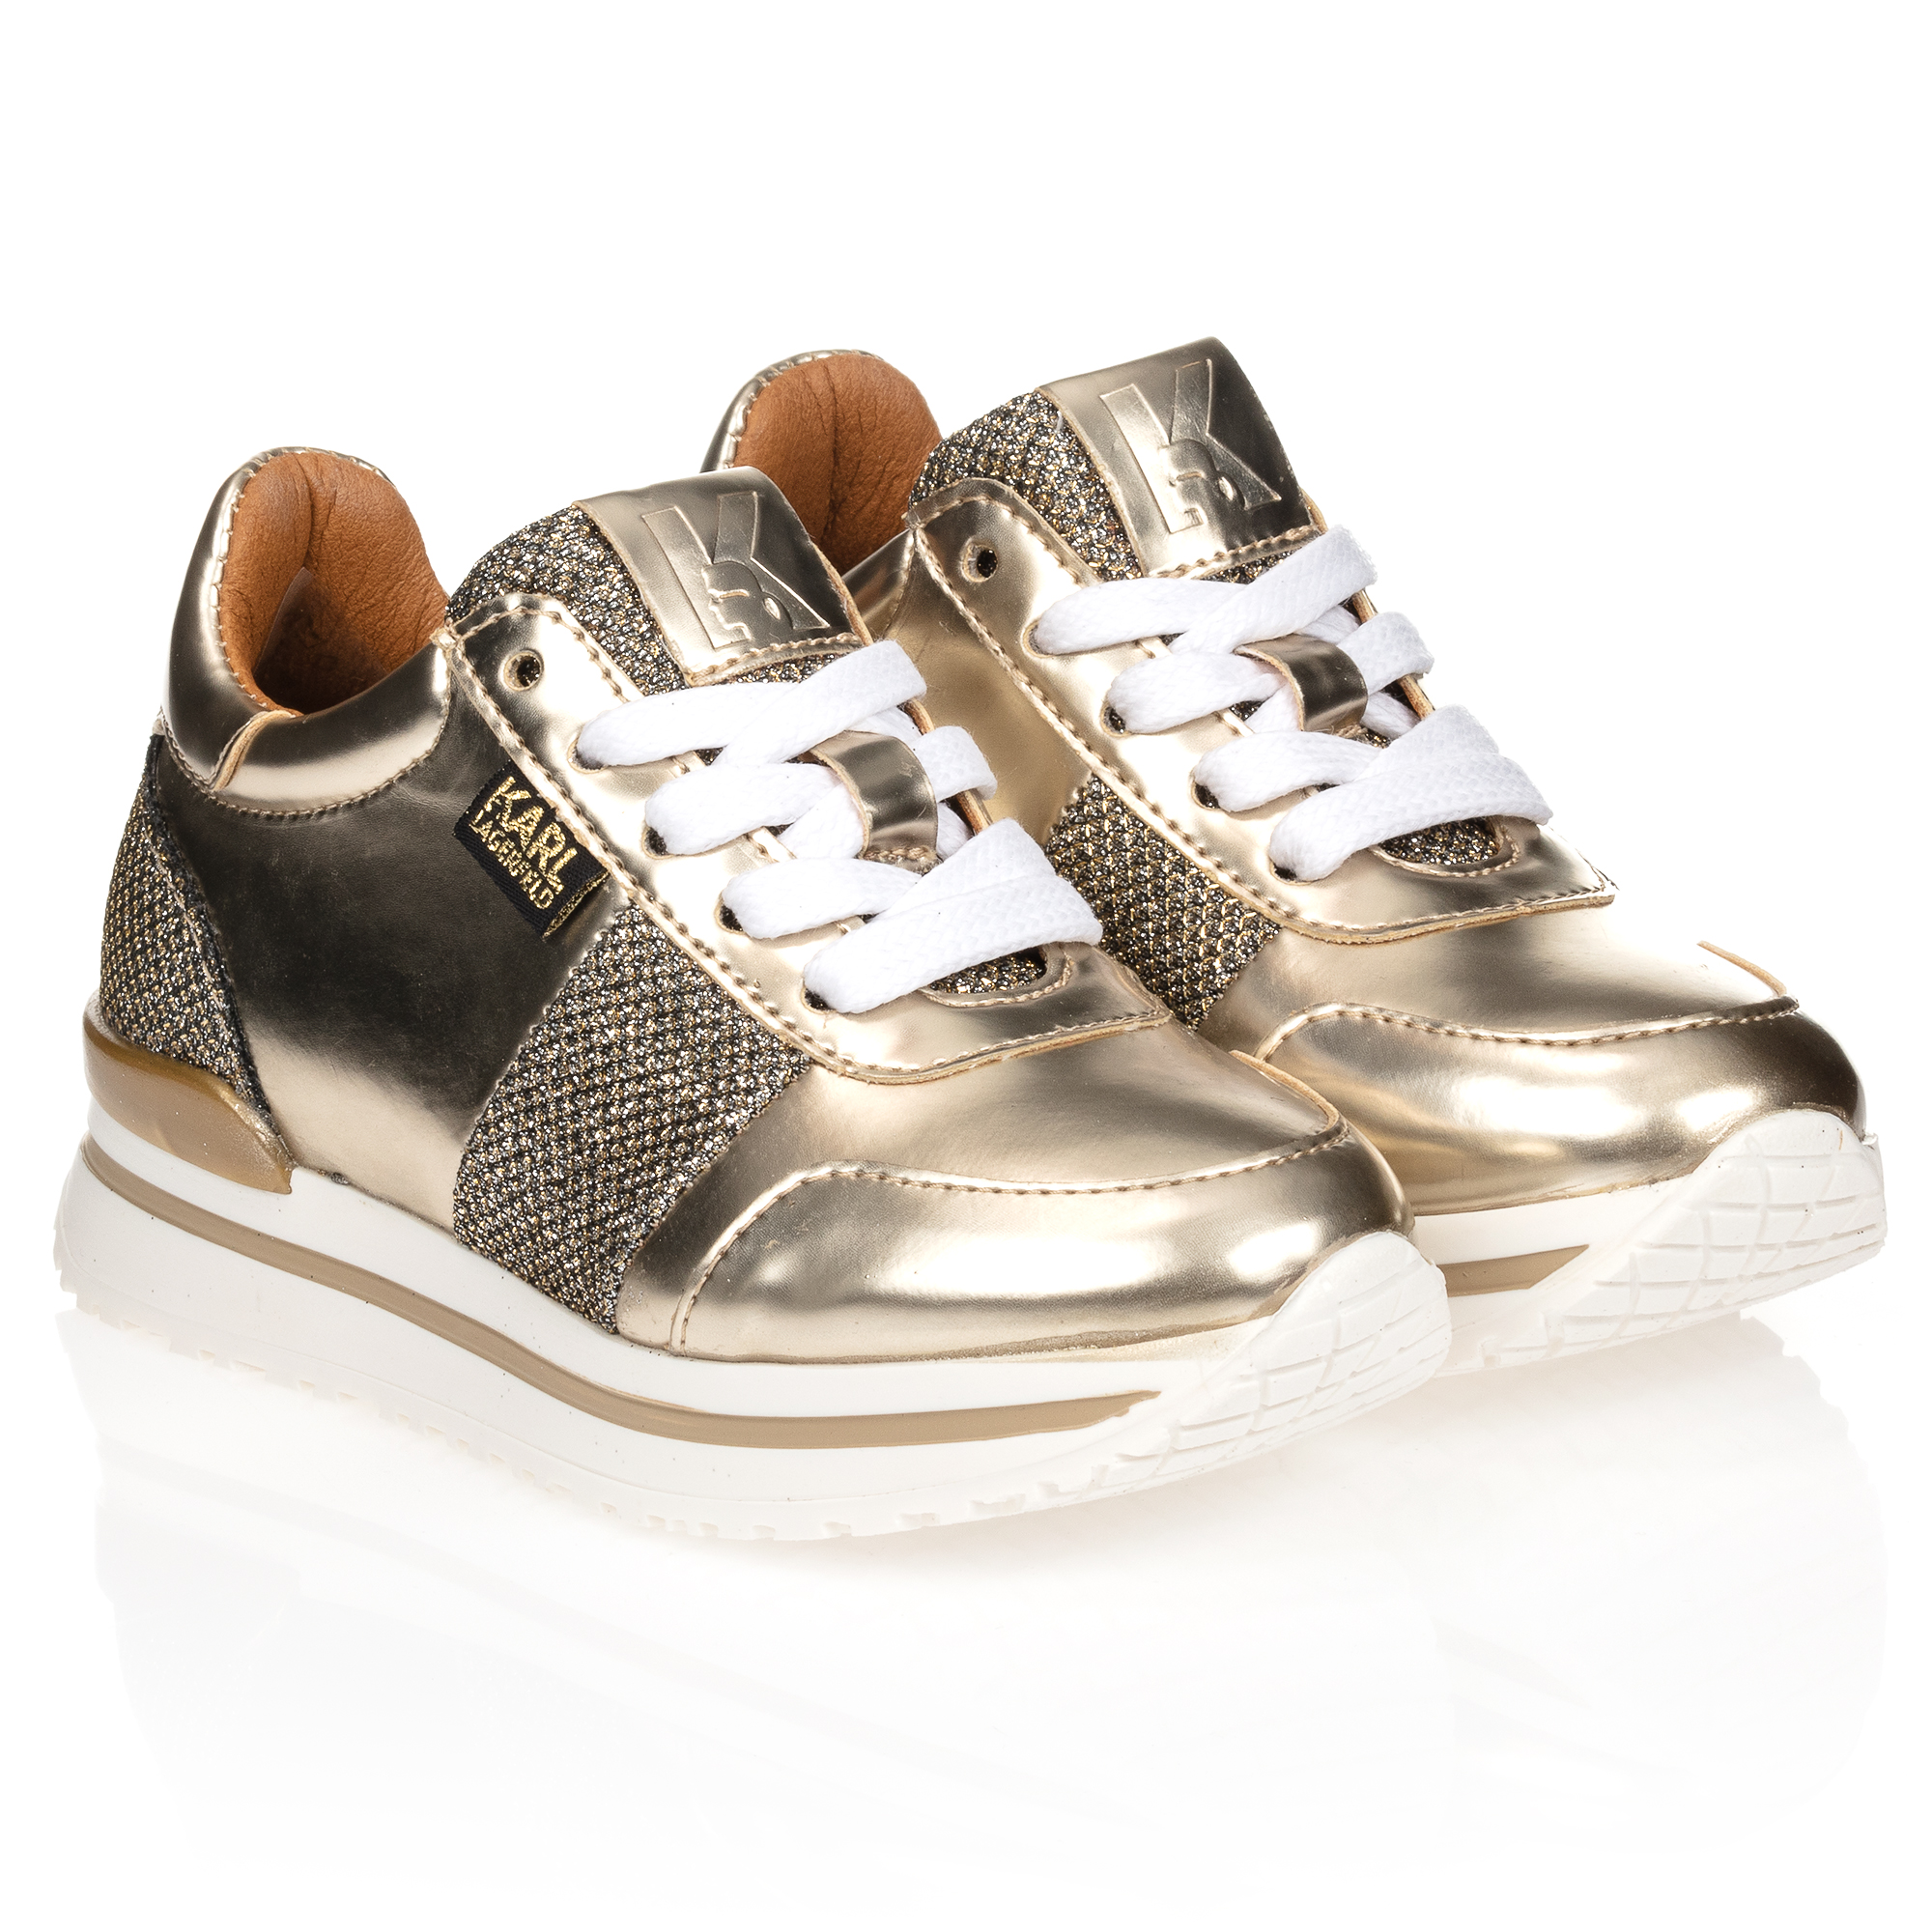 KARL LAGERFELD KIDS - Metallic Gold